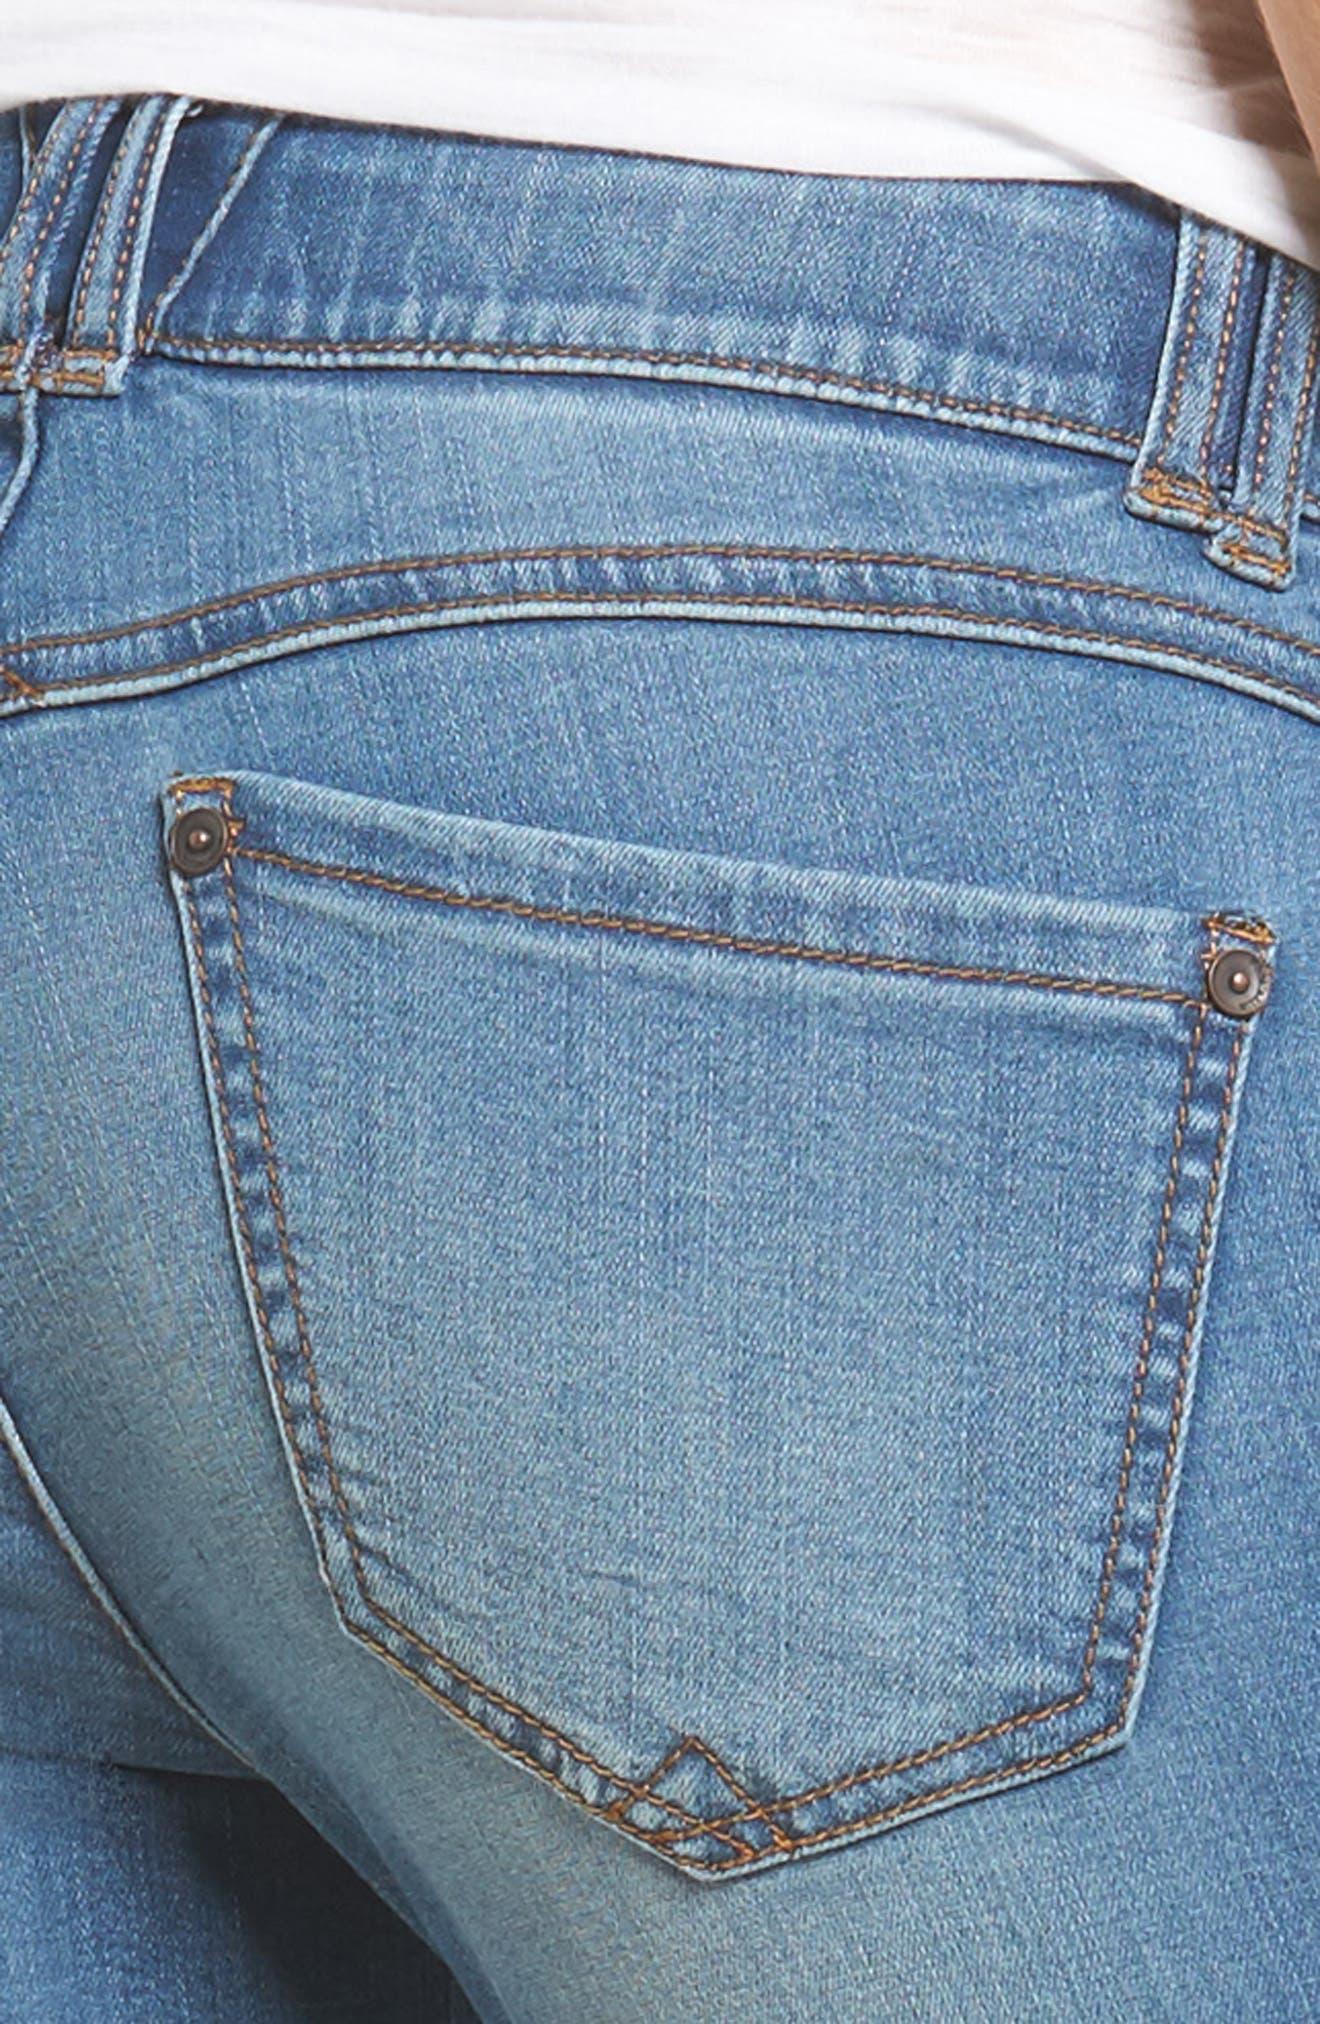 Alternate Image 4  - Wit & Wisdom Ab-solution Split Release Hem Jeans (Regular & Petite) (Nordstrom Exclusive)